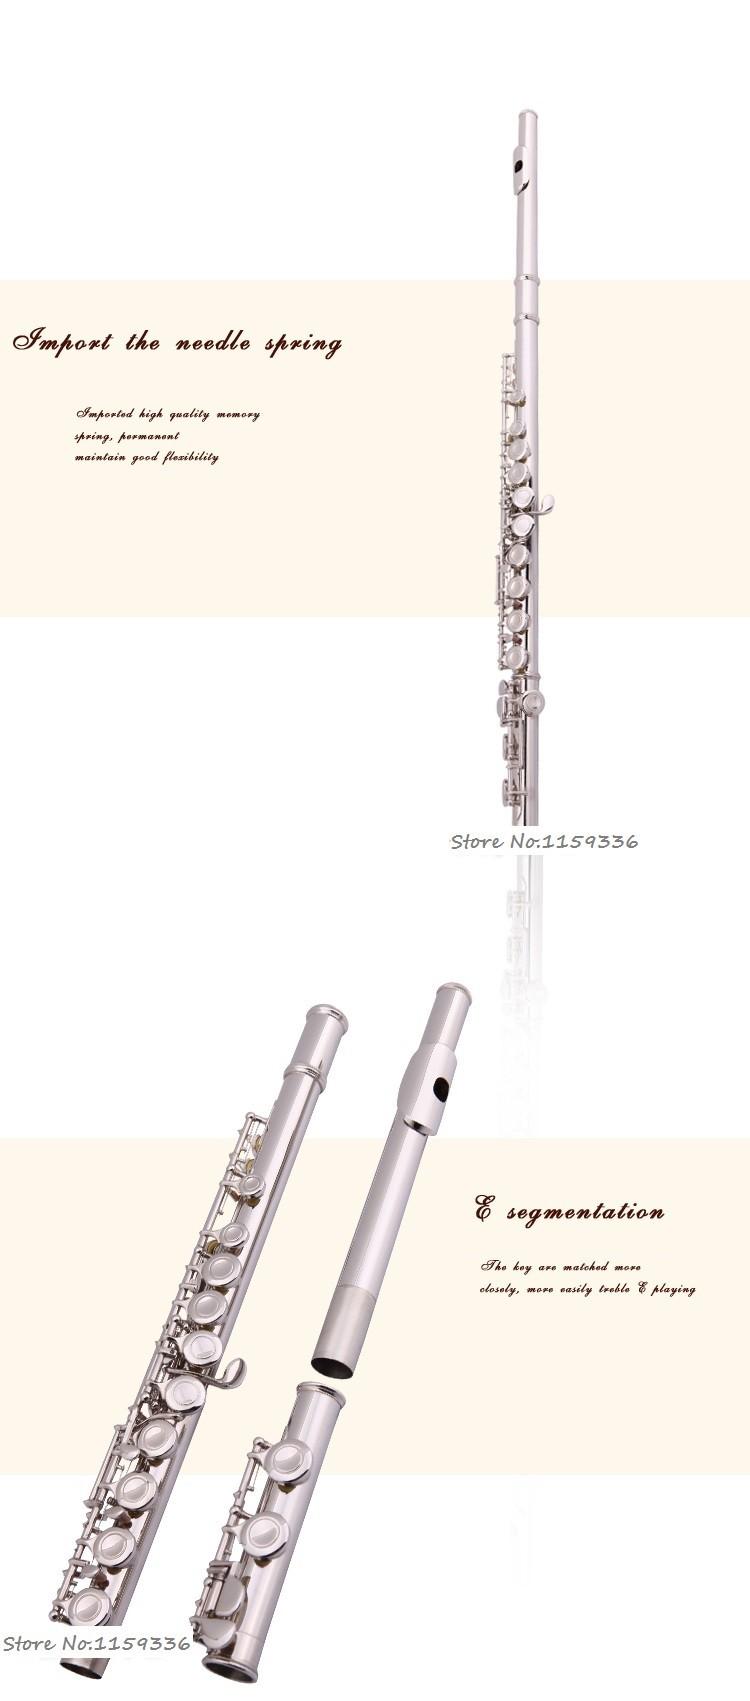 Флейта Ebene spielen Fl te, 16 e Schl ssel vernickelt Fl te, freies Verschiffen c Fl te